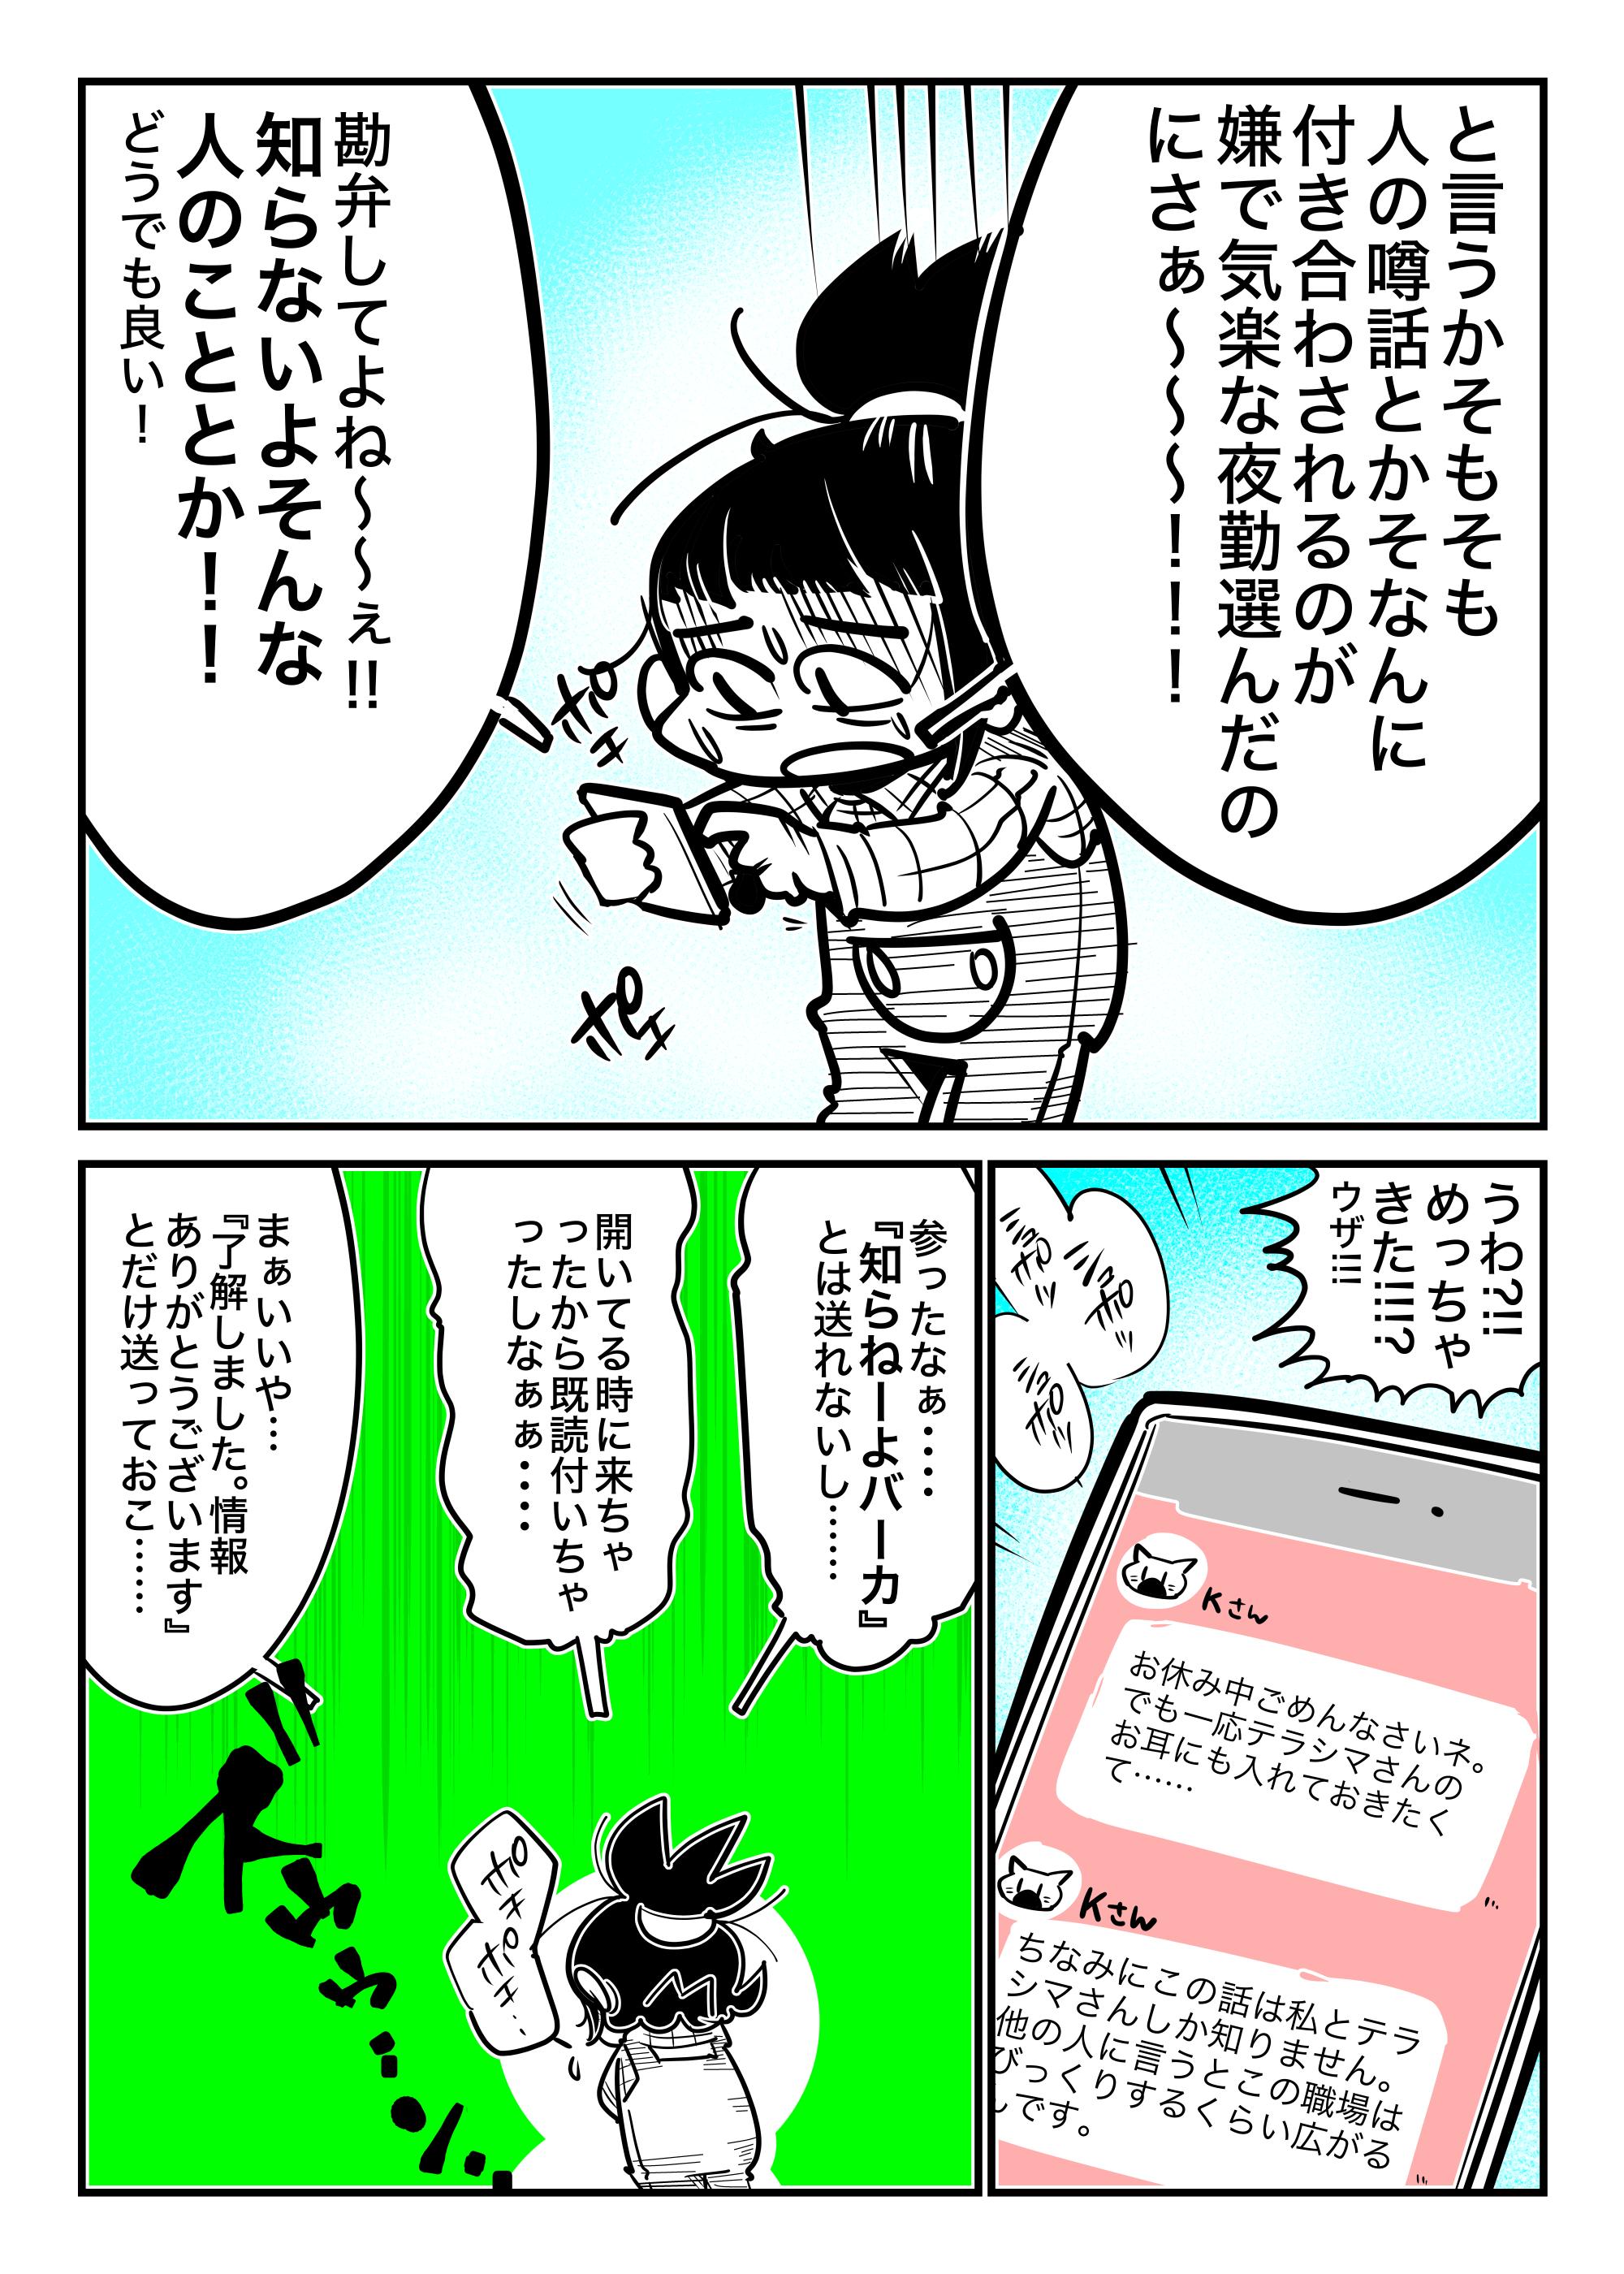 f:id:terashimaru117:20210909015007p:plain